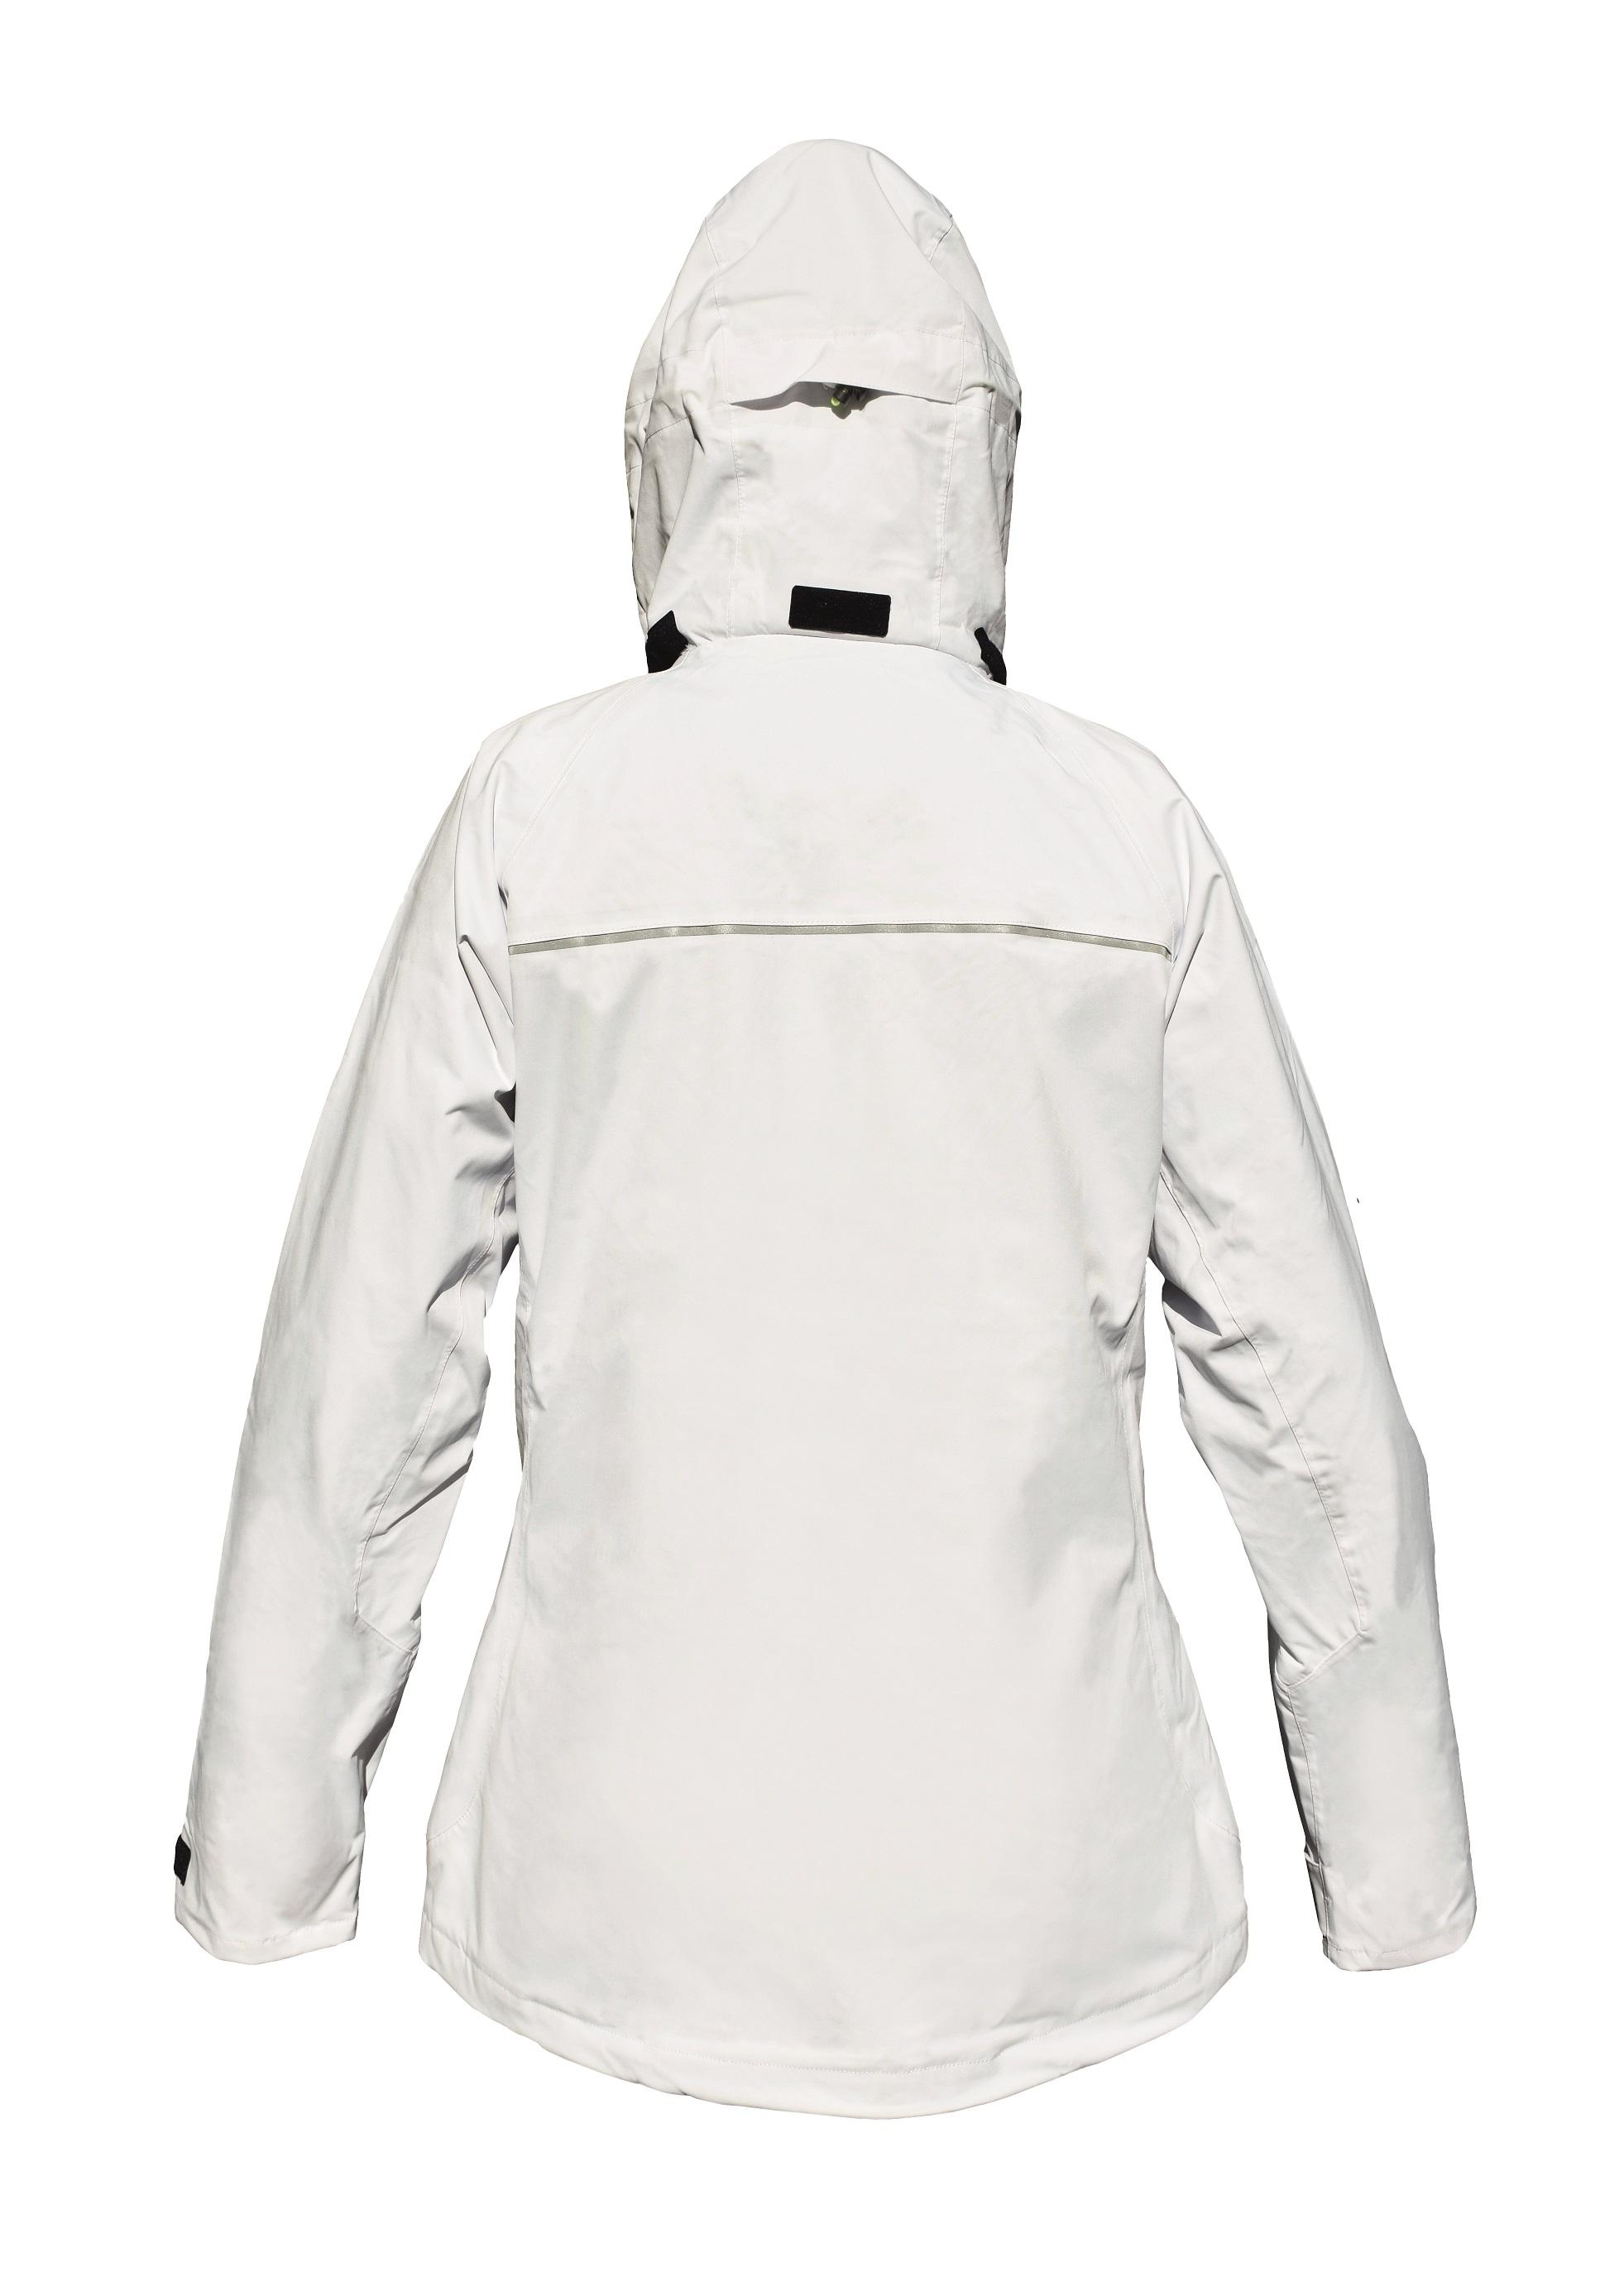 designer fashion 6b2f5 26210 Brisbane Damen Jacke, weiß S